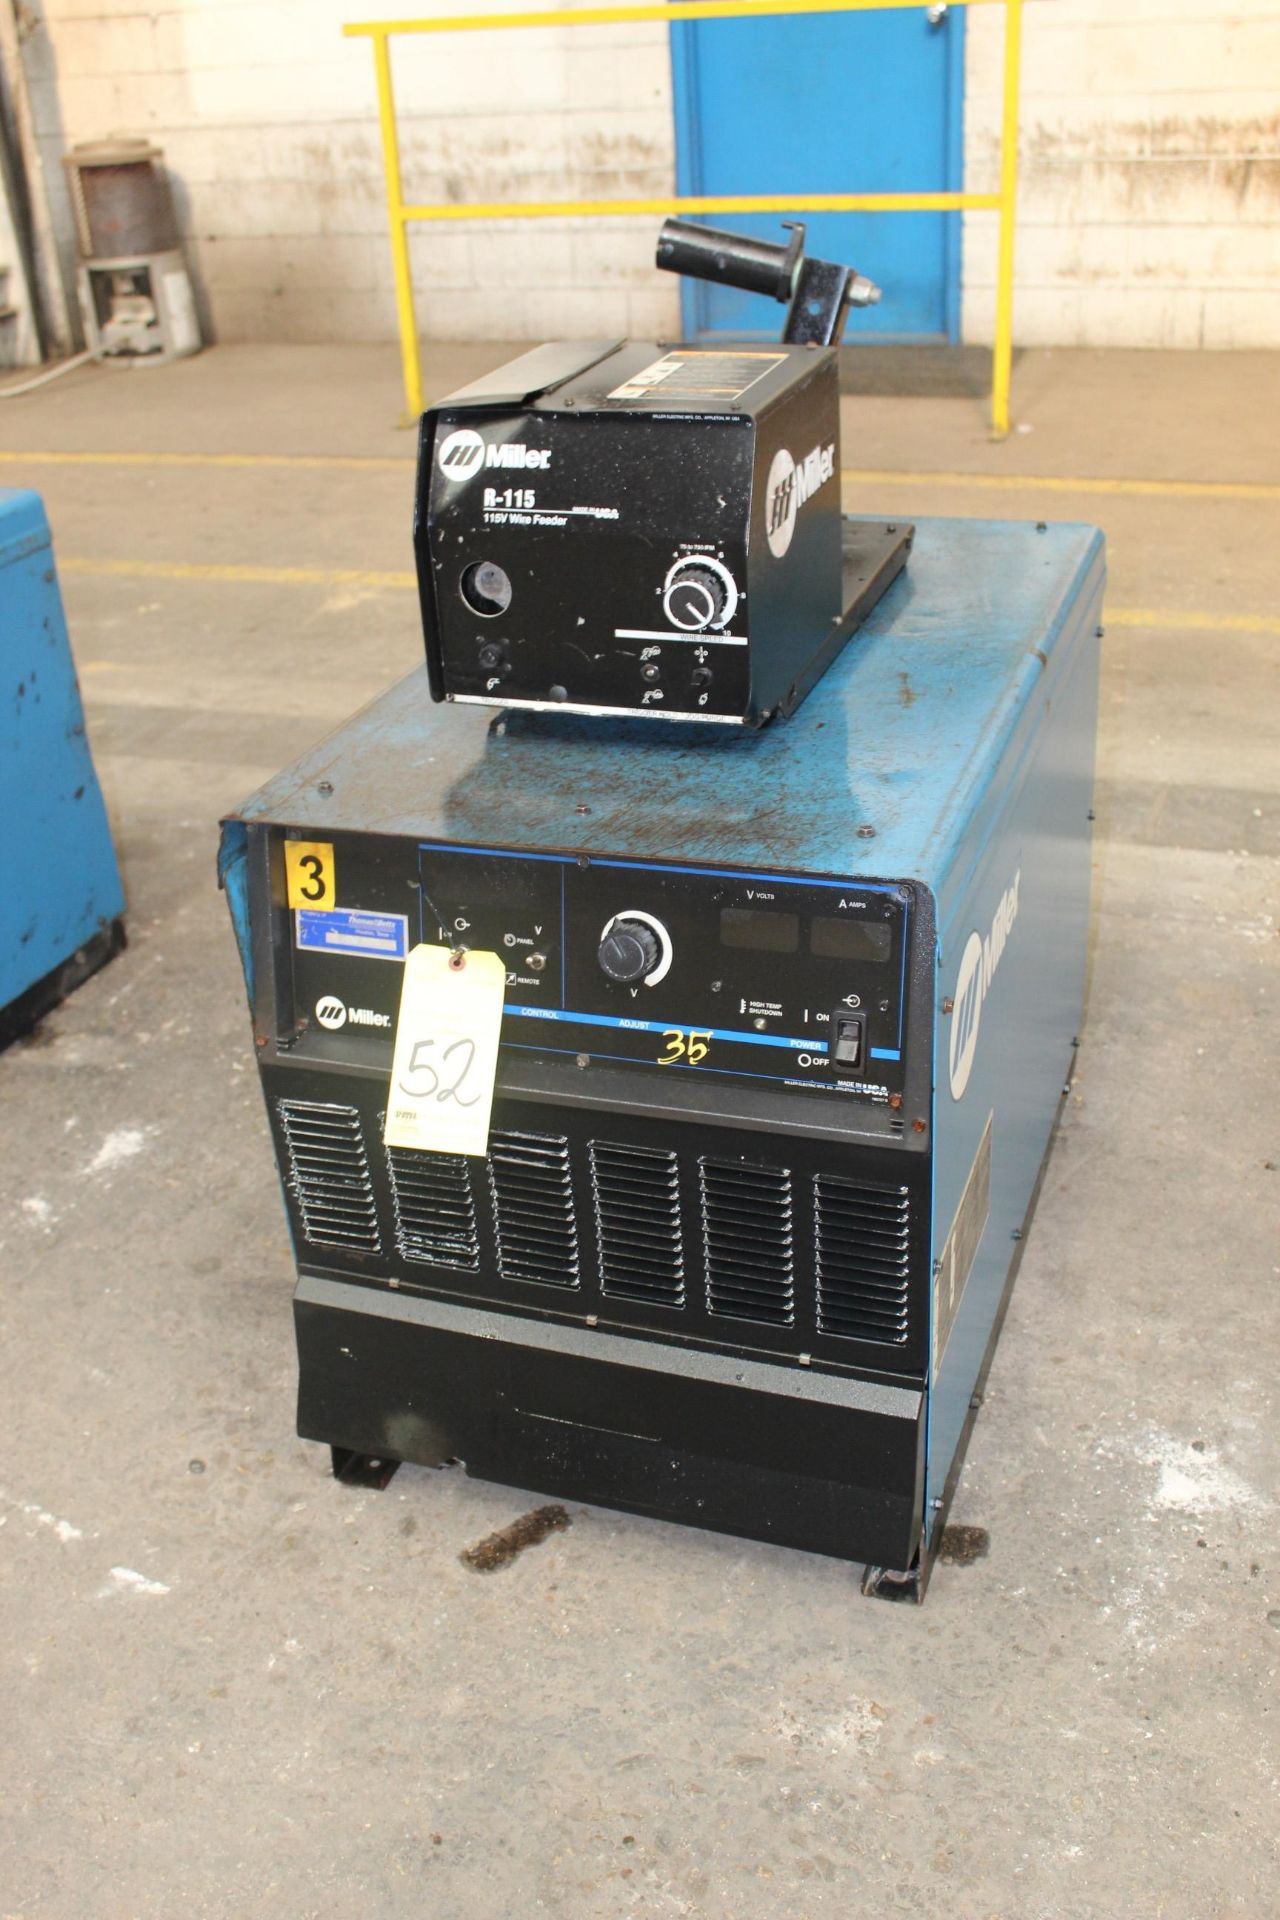 Lot 52 - WELDING MACHINE, MILLER MDL. DELTAWELD 652, 650 amps @ 44 v., 100% duty cycle, Miller R115 wire